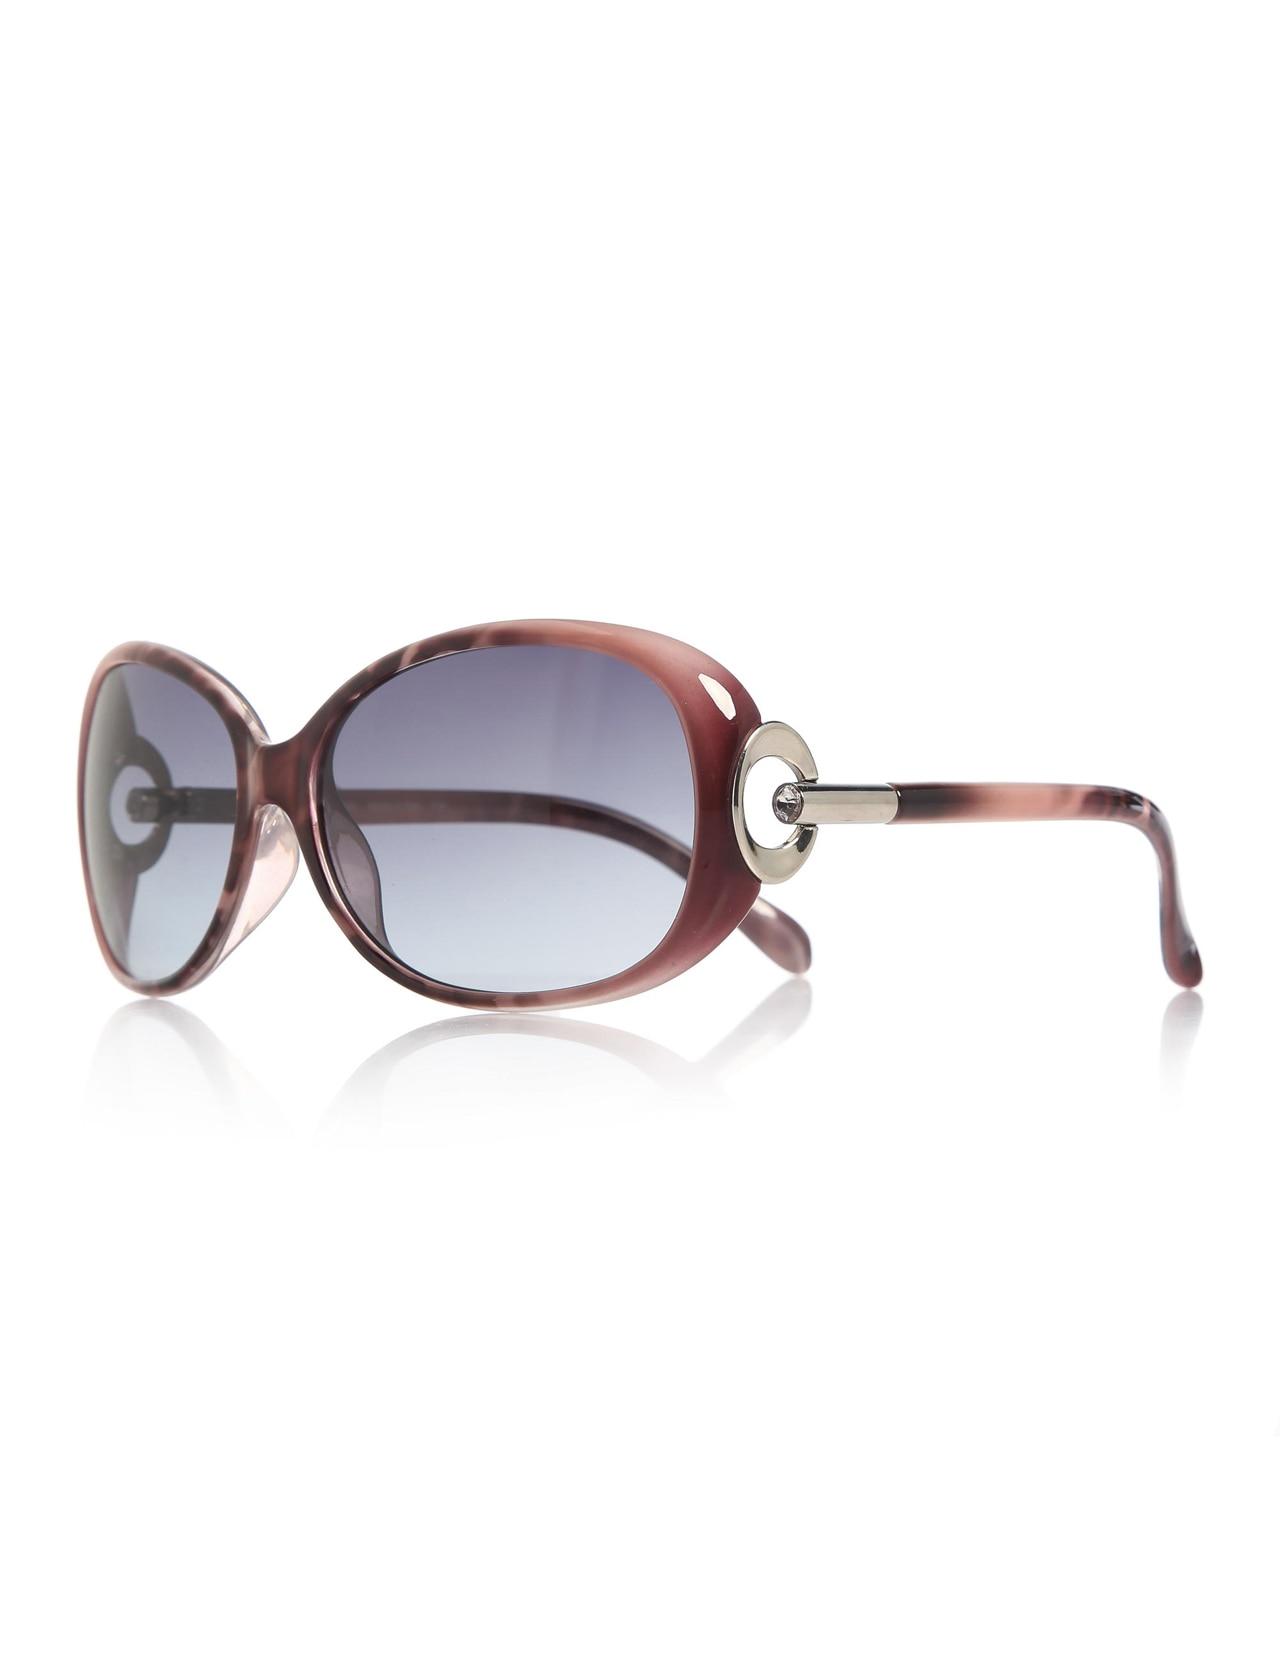 Women's sunglasses e 1623 8513 bone purple organic 62 -- exess